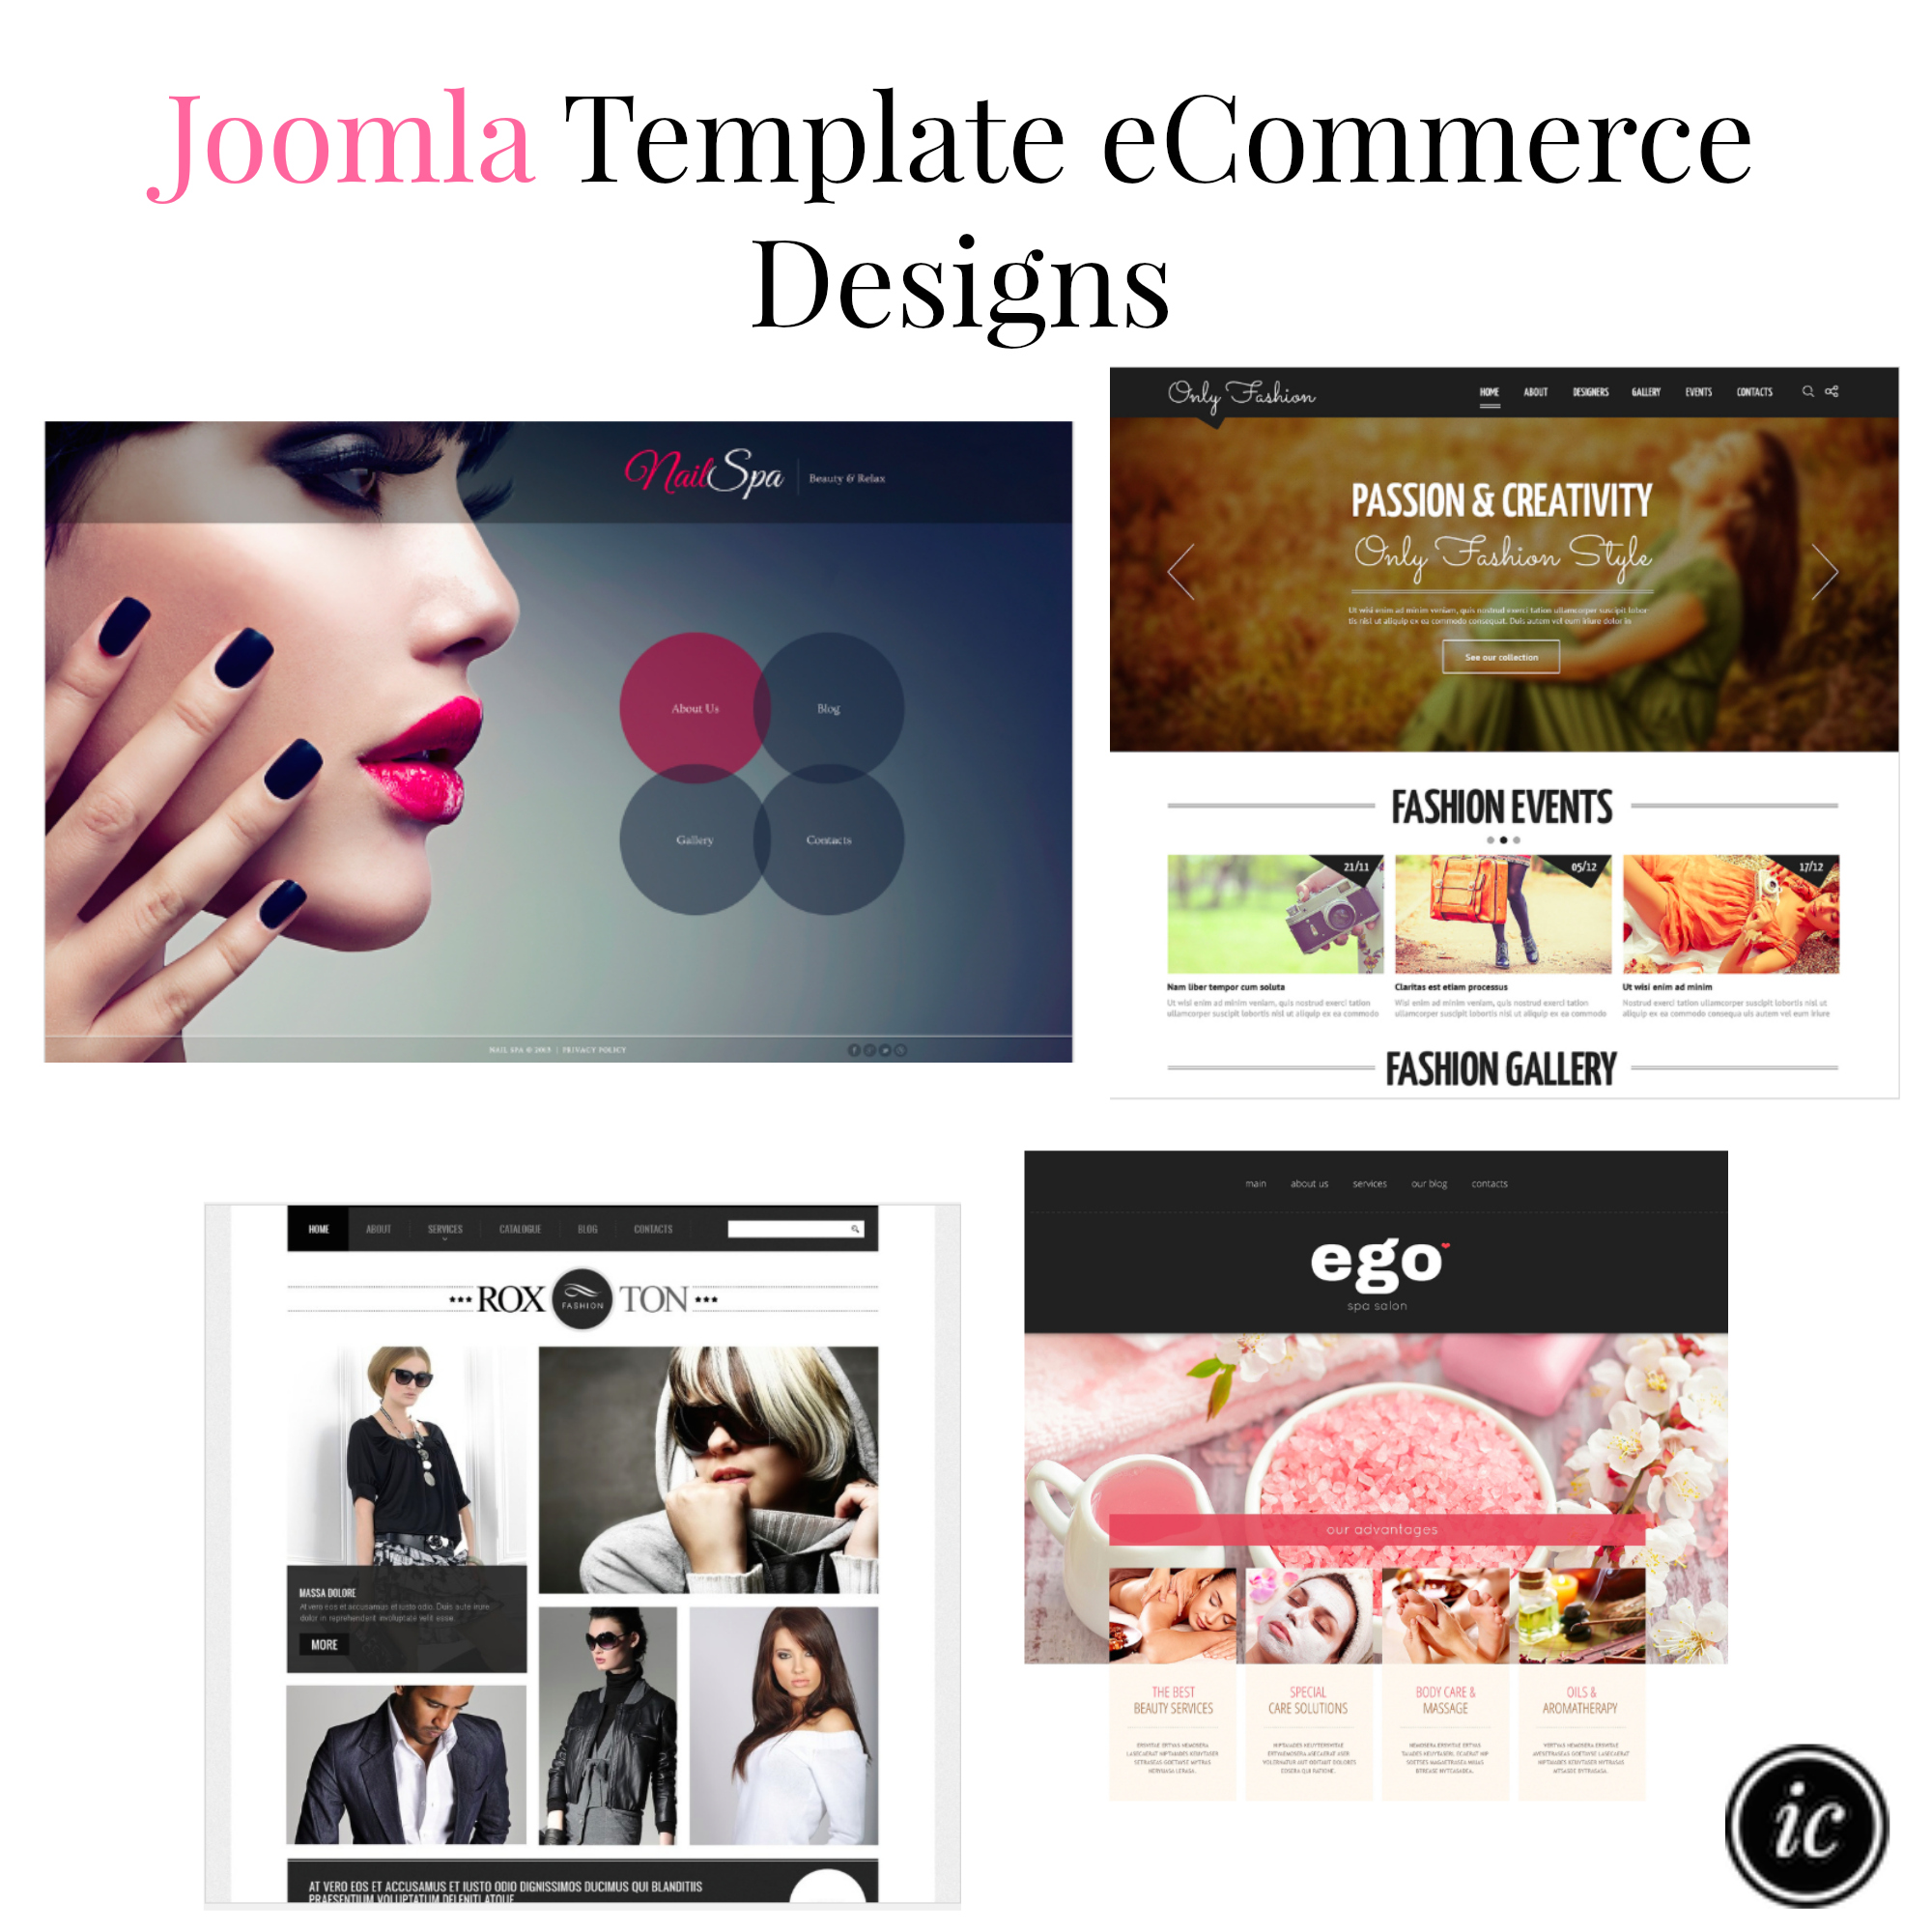 Joomla Template eCommerce Designs